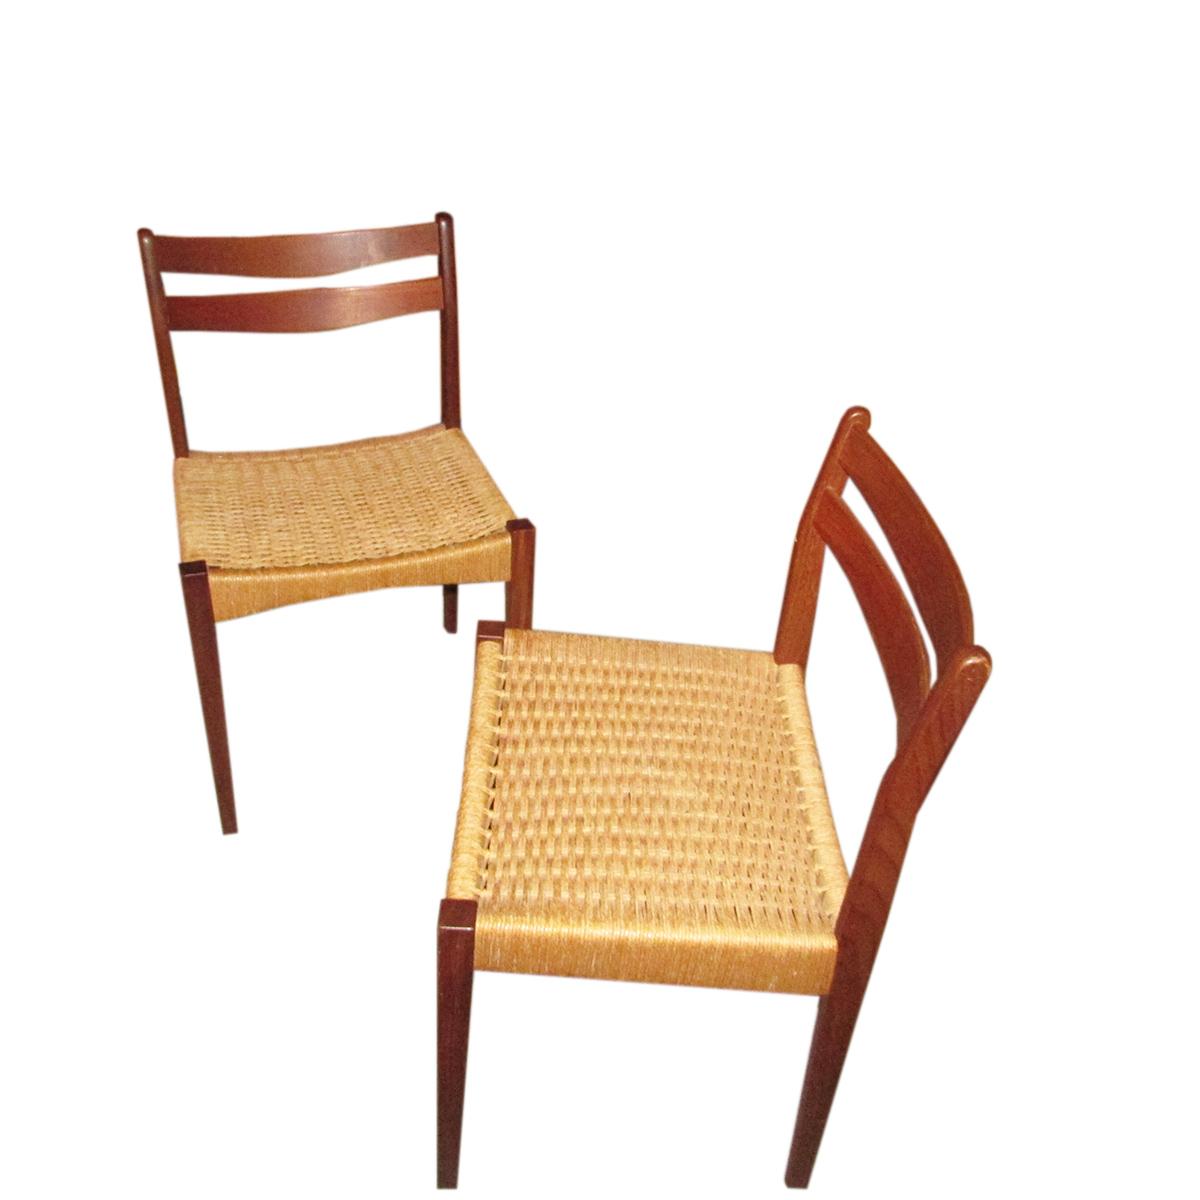 mid-century-teak-chair-mogen-kolds-vintage-danish